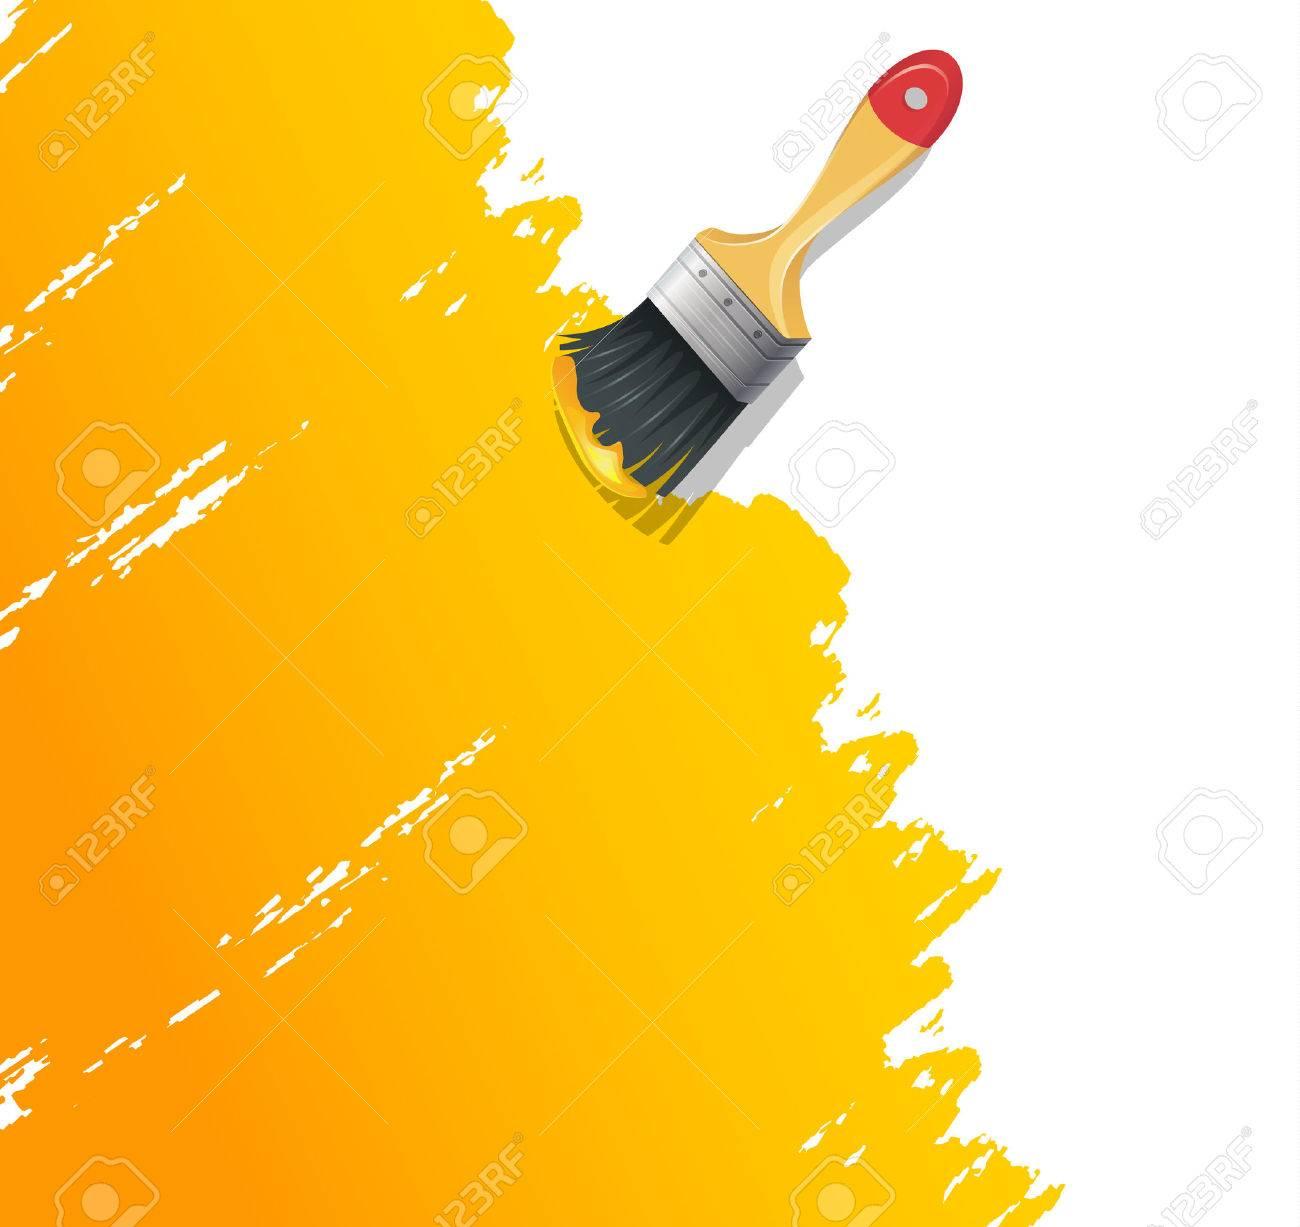 Vector illustration of Paint brush with splash - 26161096